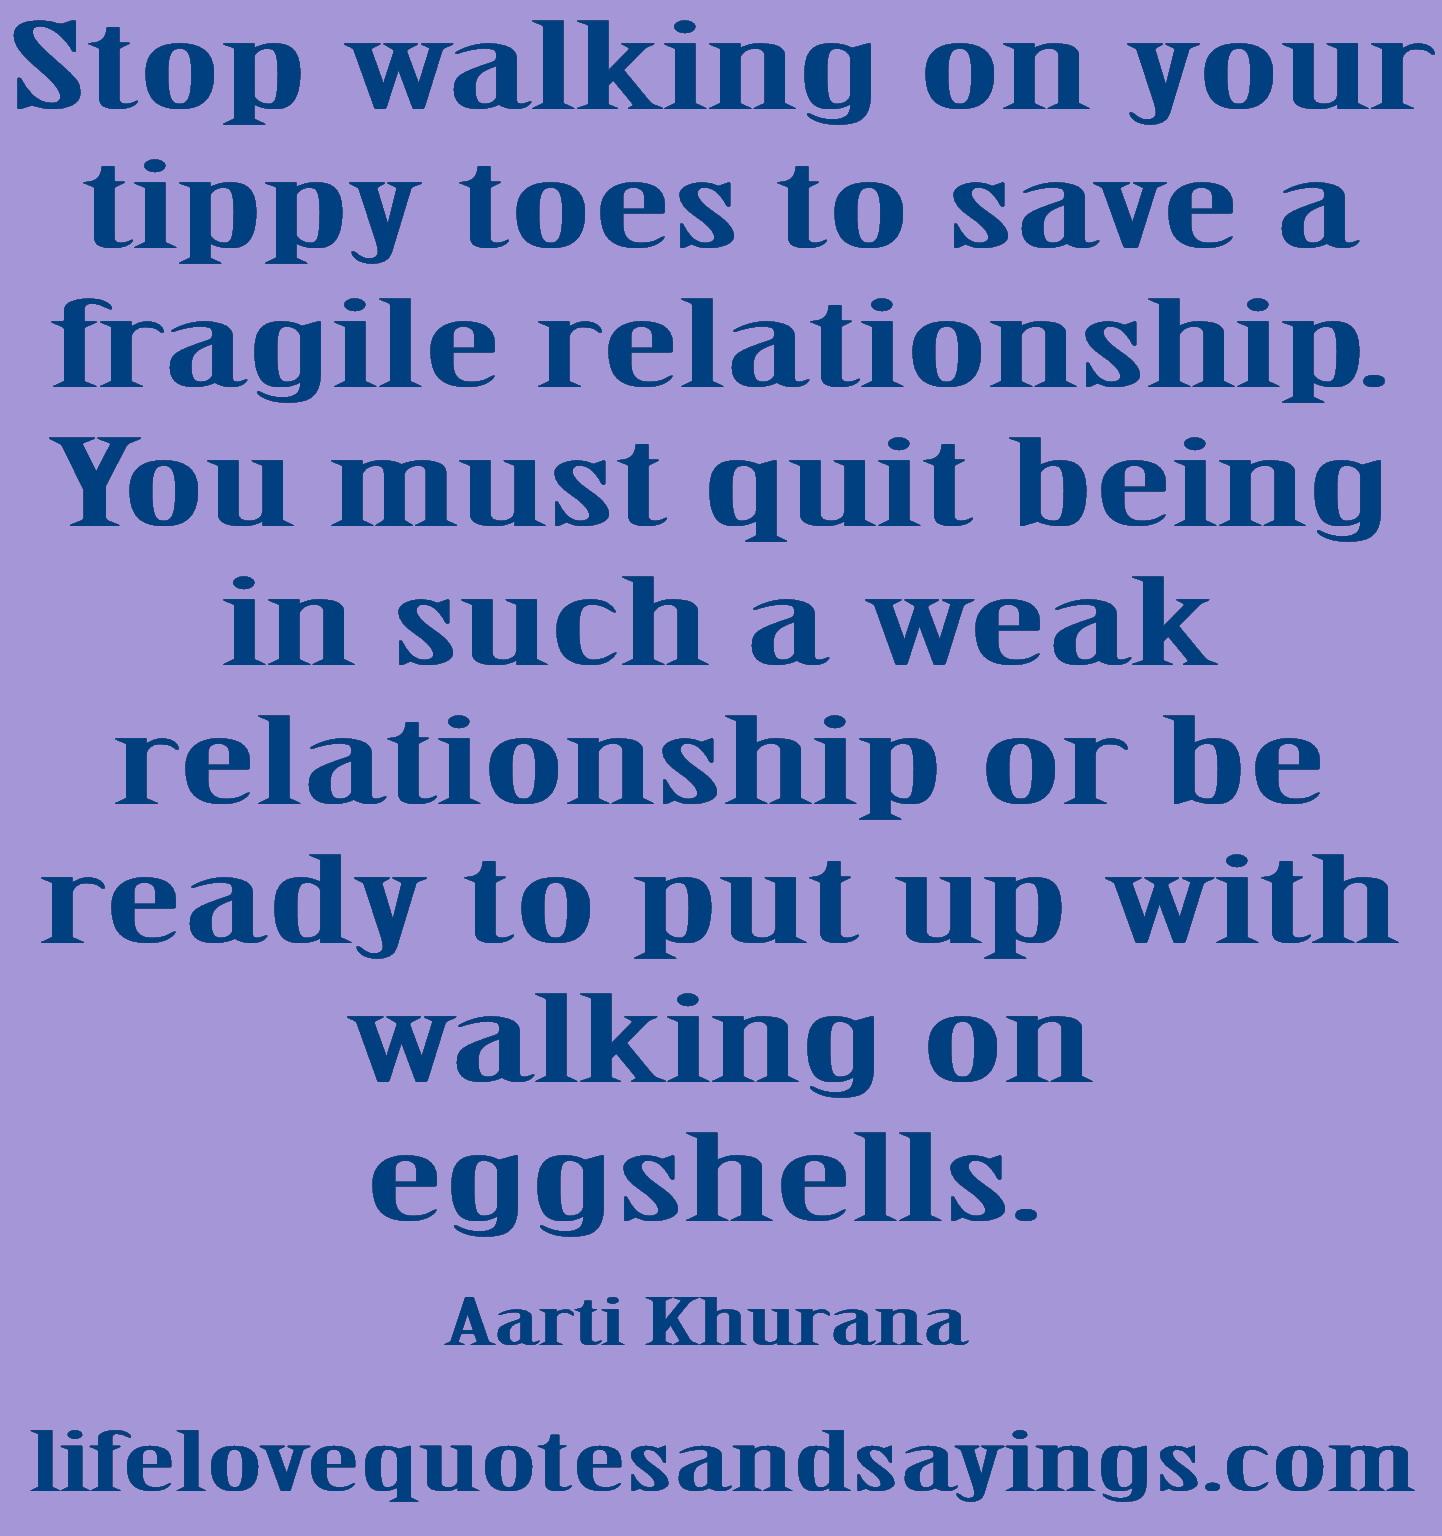 Walking on eggshells relationship